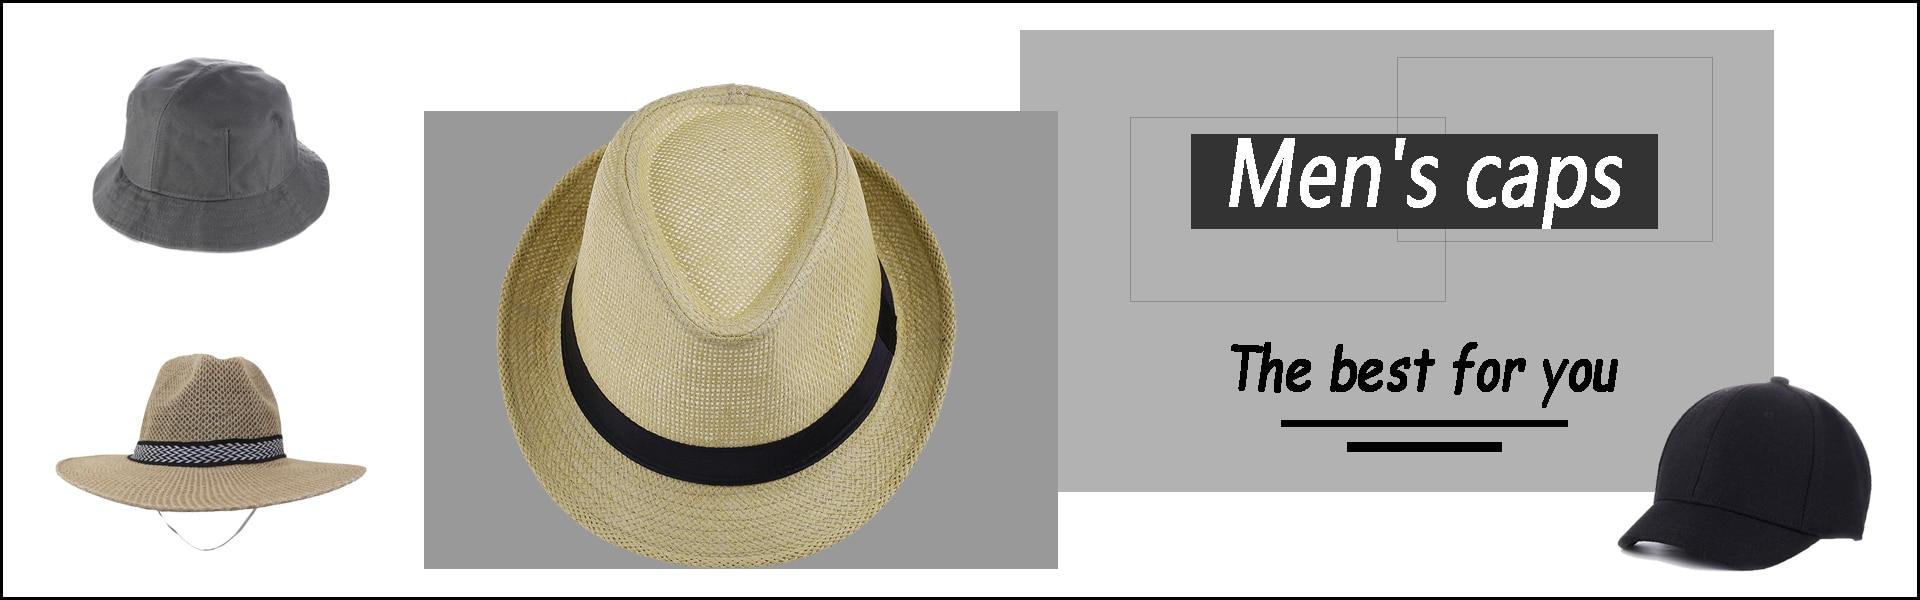 2018 Fashion New Elegant Black Jazz Hats For Women White Sun Hat Men Formal  Blue Summer Beach Cap Letter M Fedora Straw Hat d751be949f39